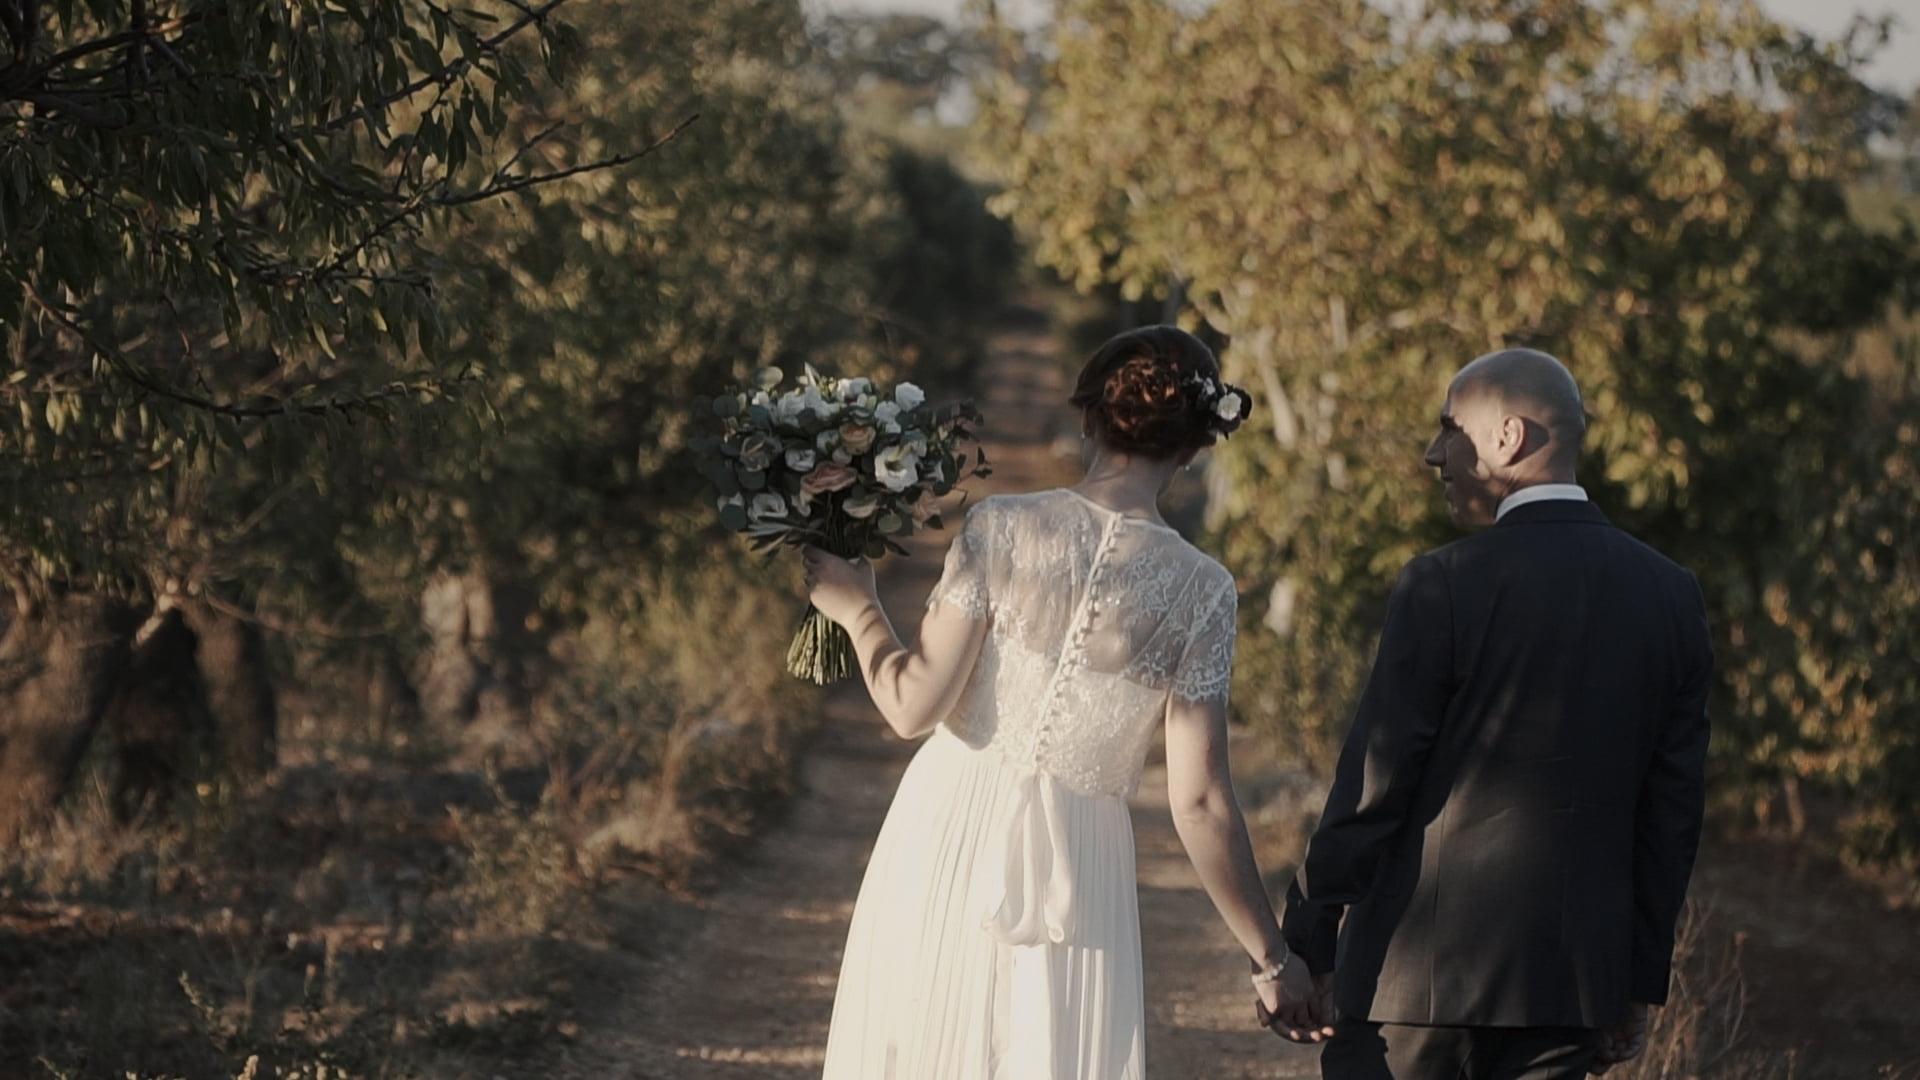 014 destination wedding videographer italy